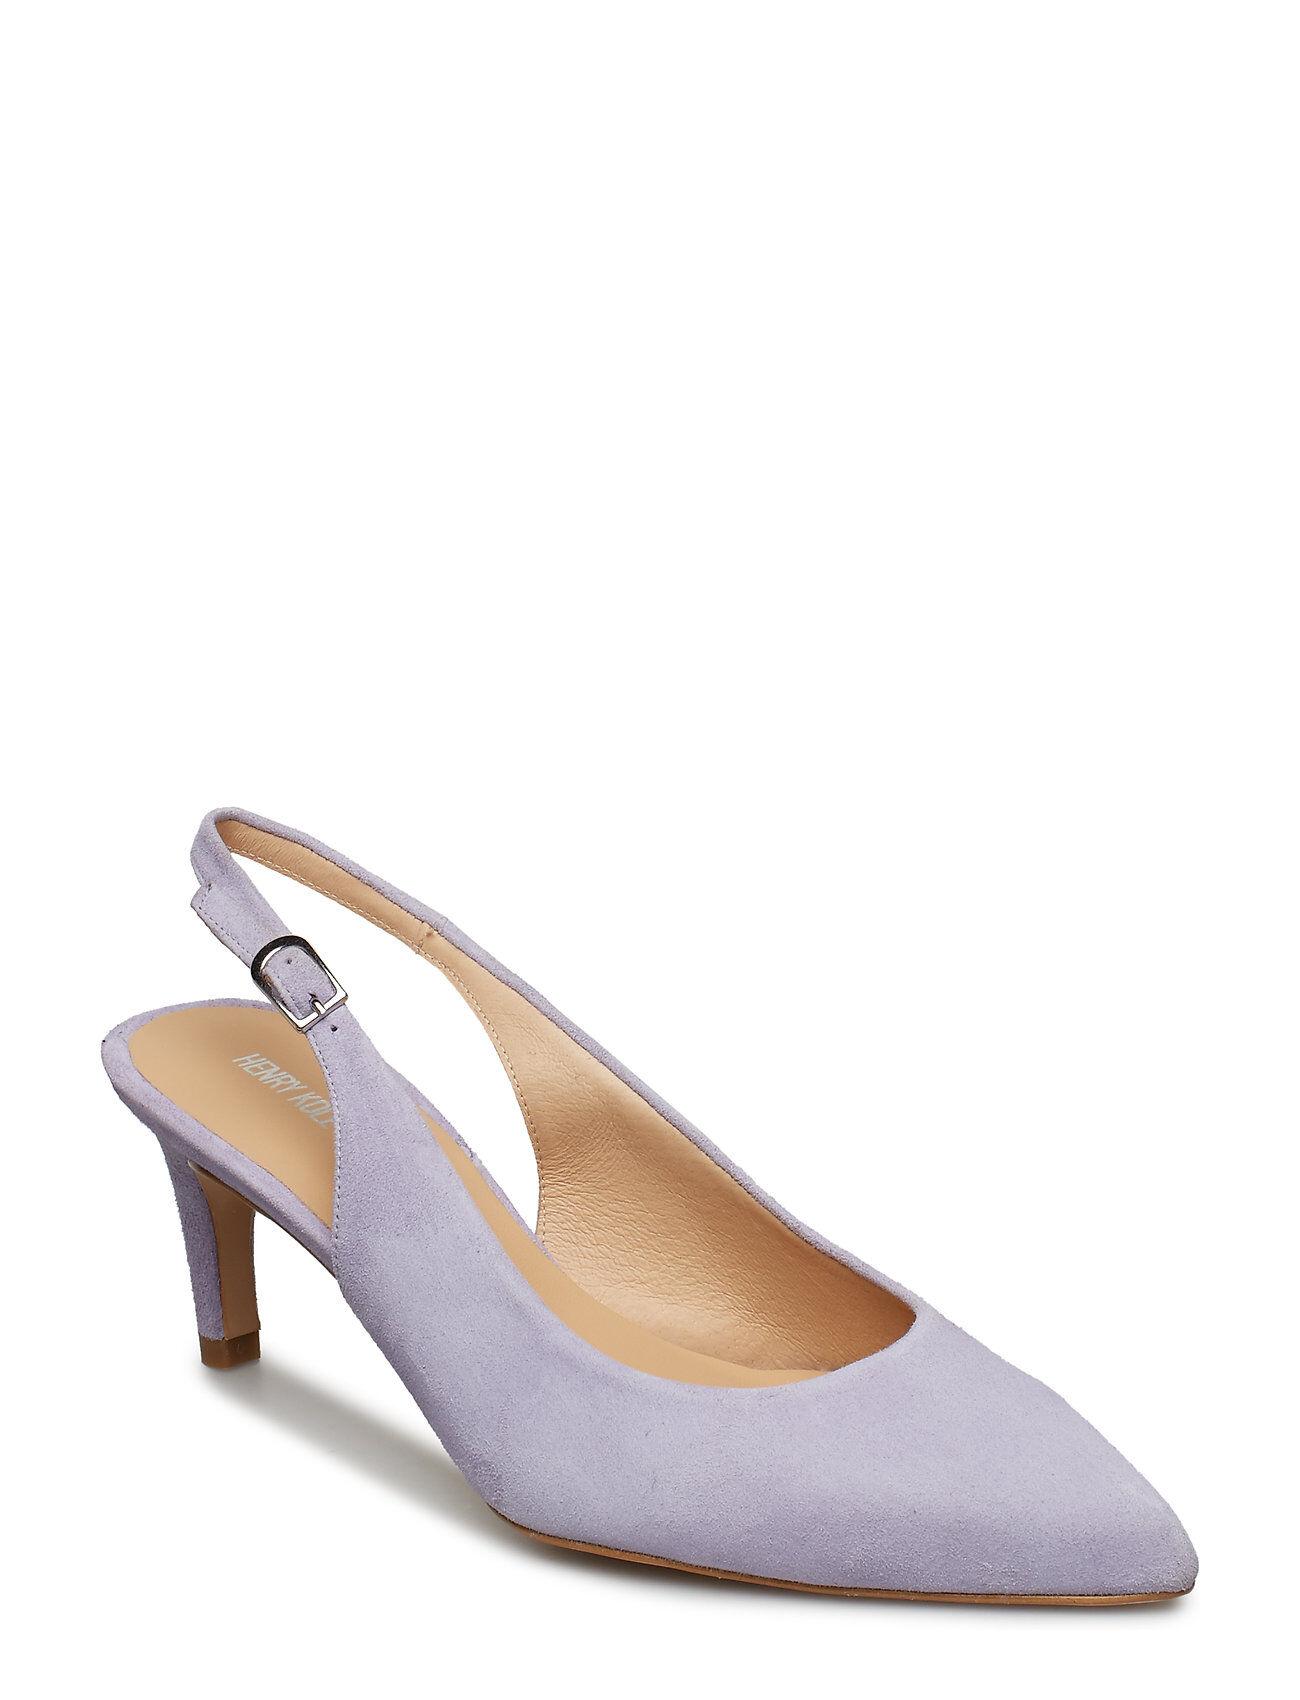 Henry Kole Lisa Suede Black Shoes Heels Pumps Sling Backs Beige Henry Kole